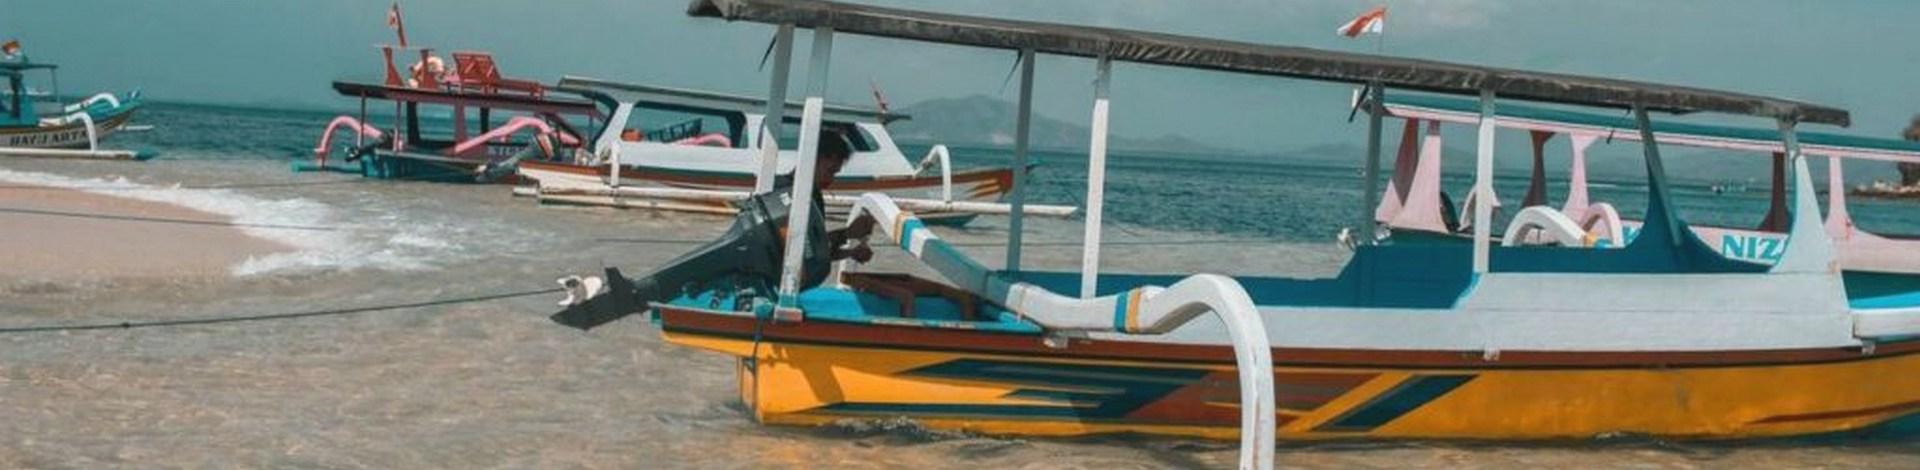 Barque Bali bateau Indonésie